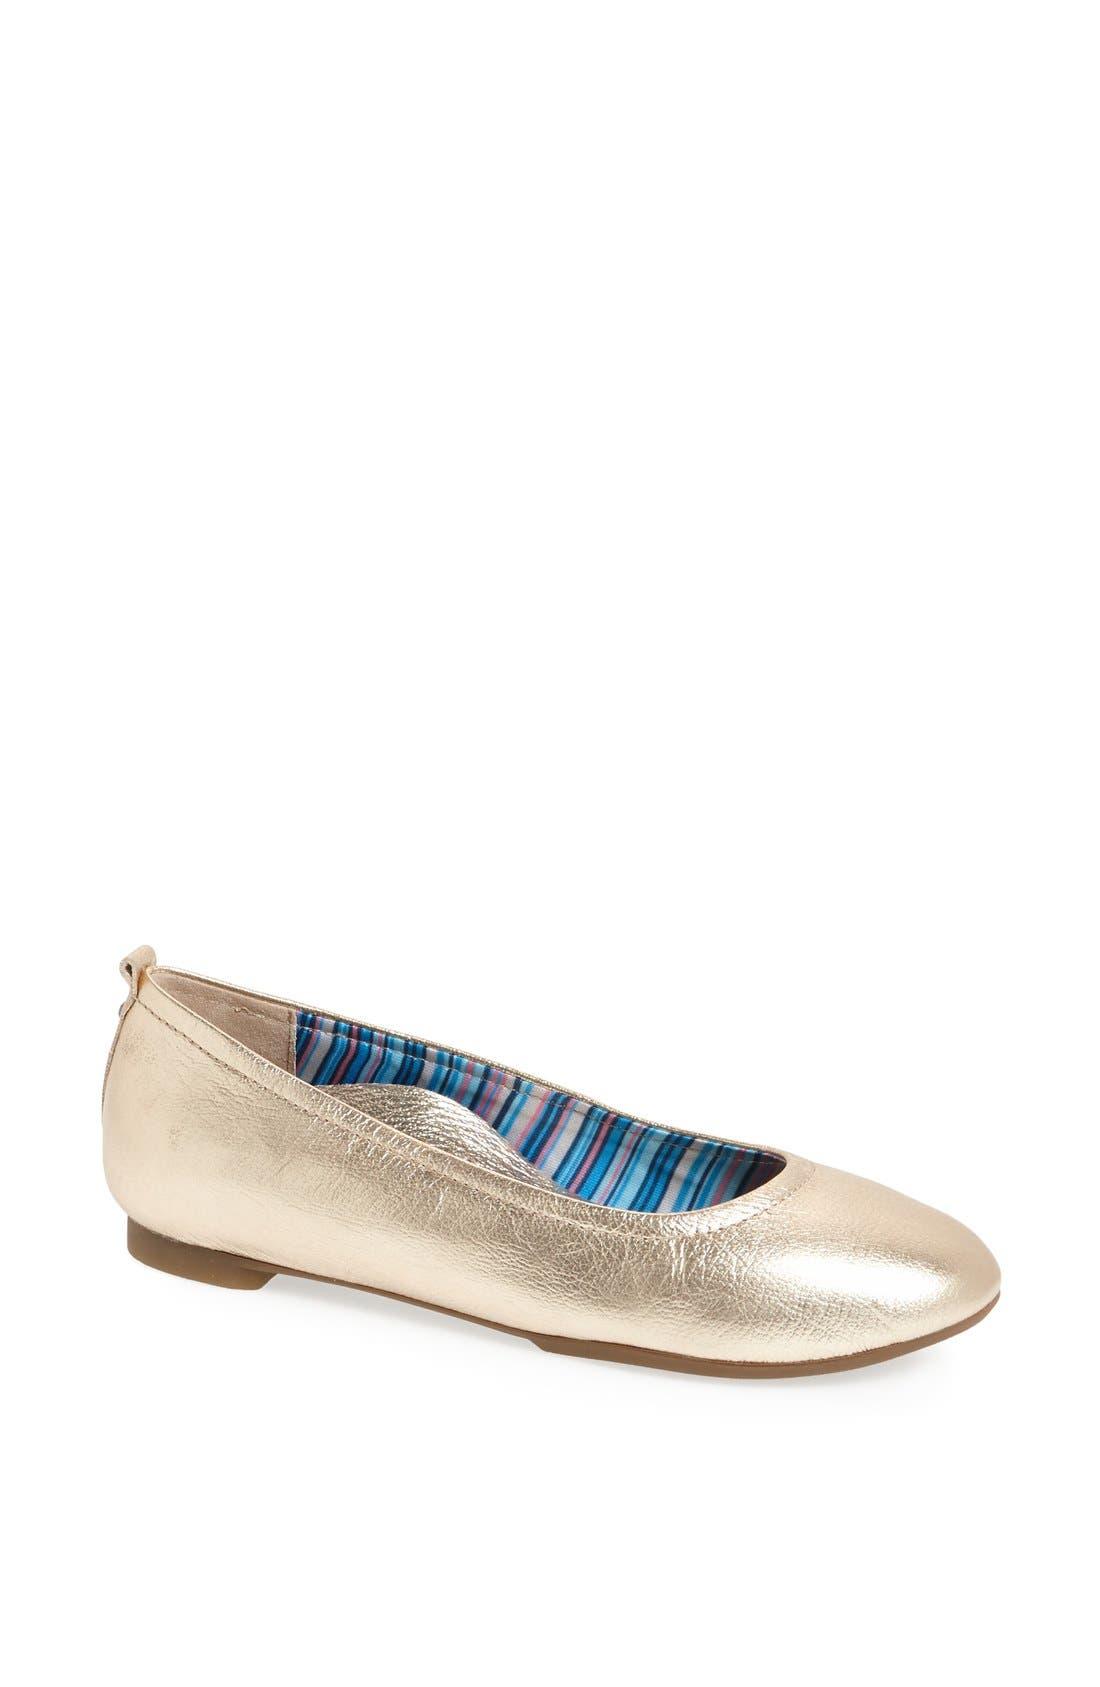 Alternate Image 1 Selected - Aetrex 'Erica' Ballet Flat